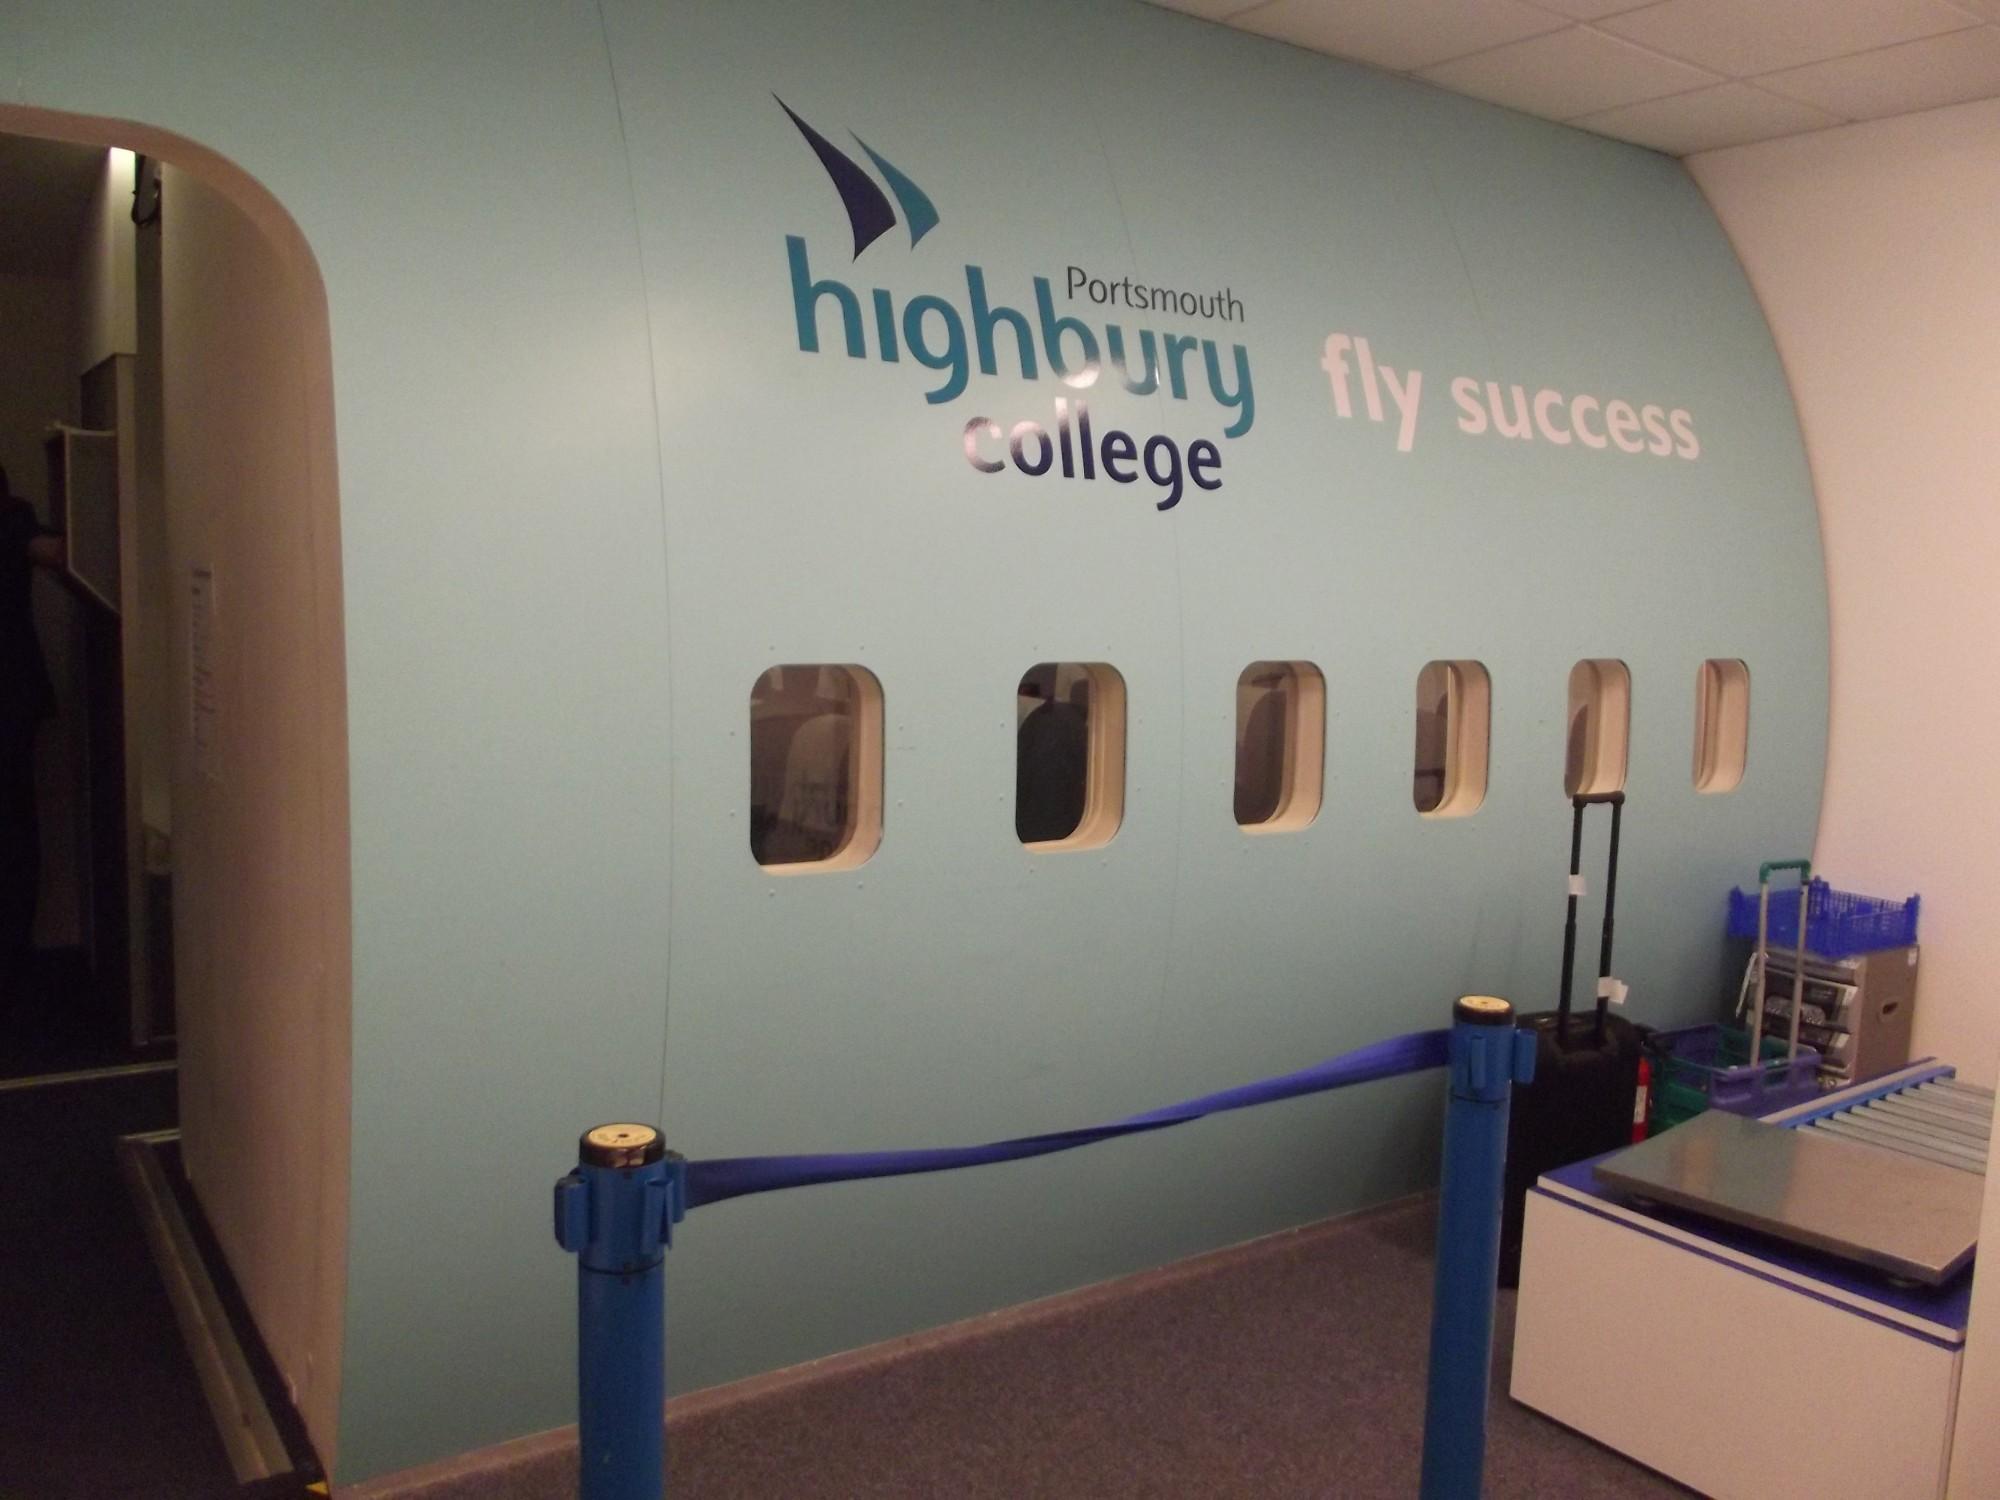 Highbury-Lowestoft-JUne-2014-002-e1423670562802